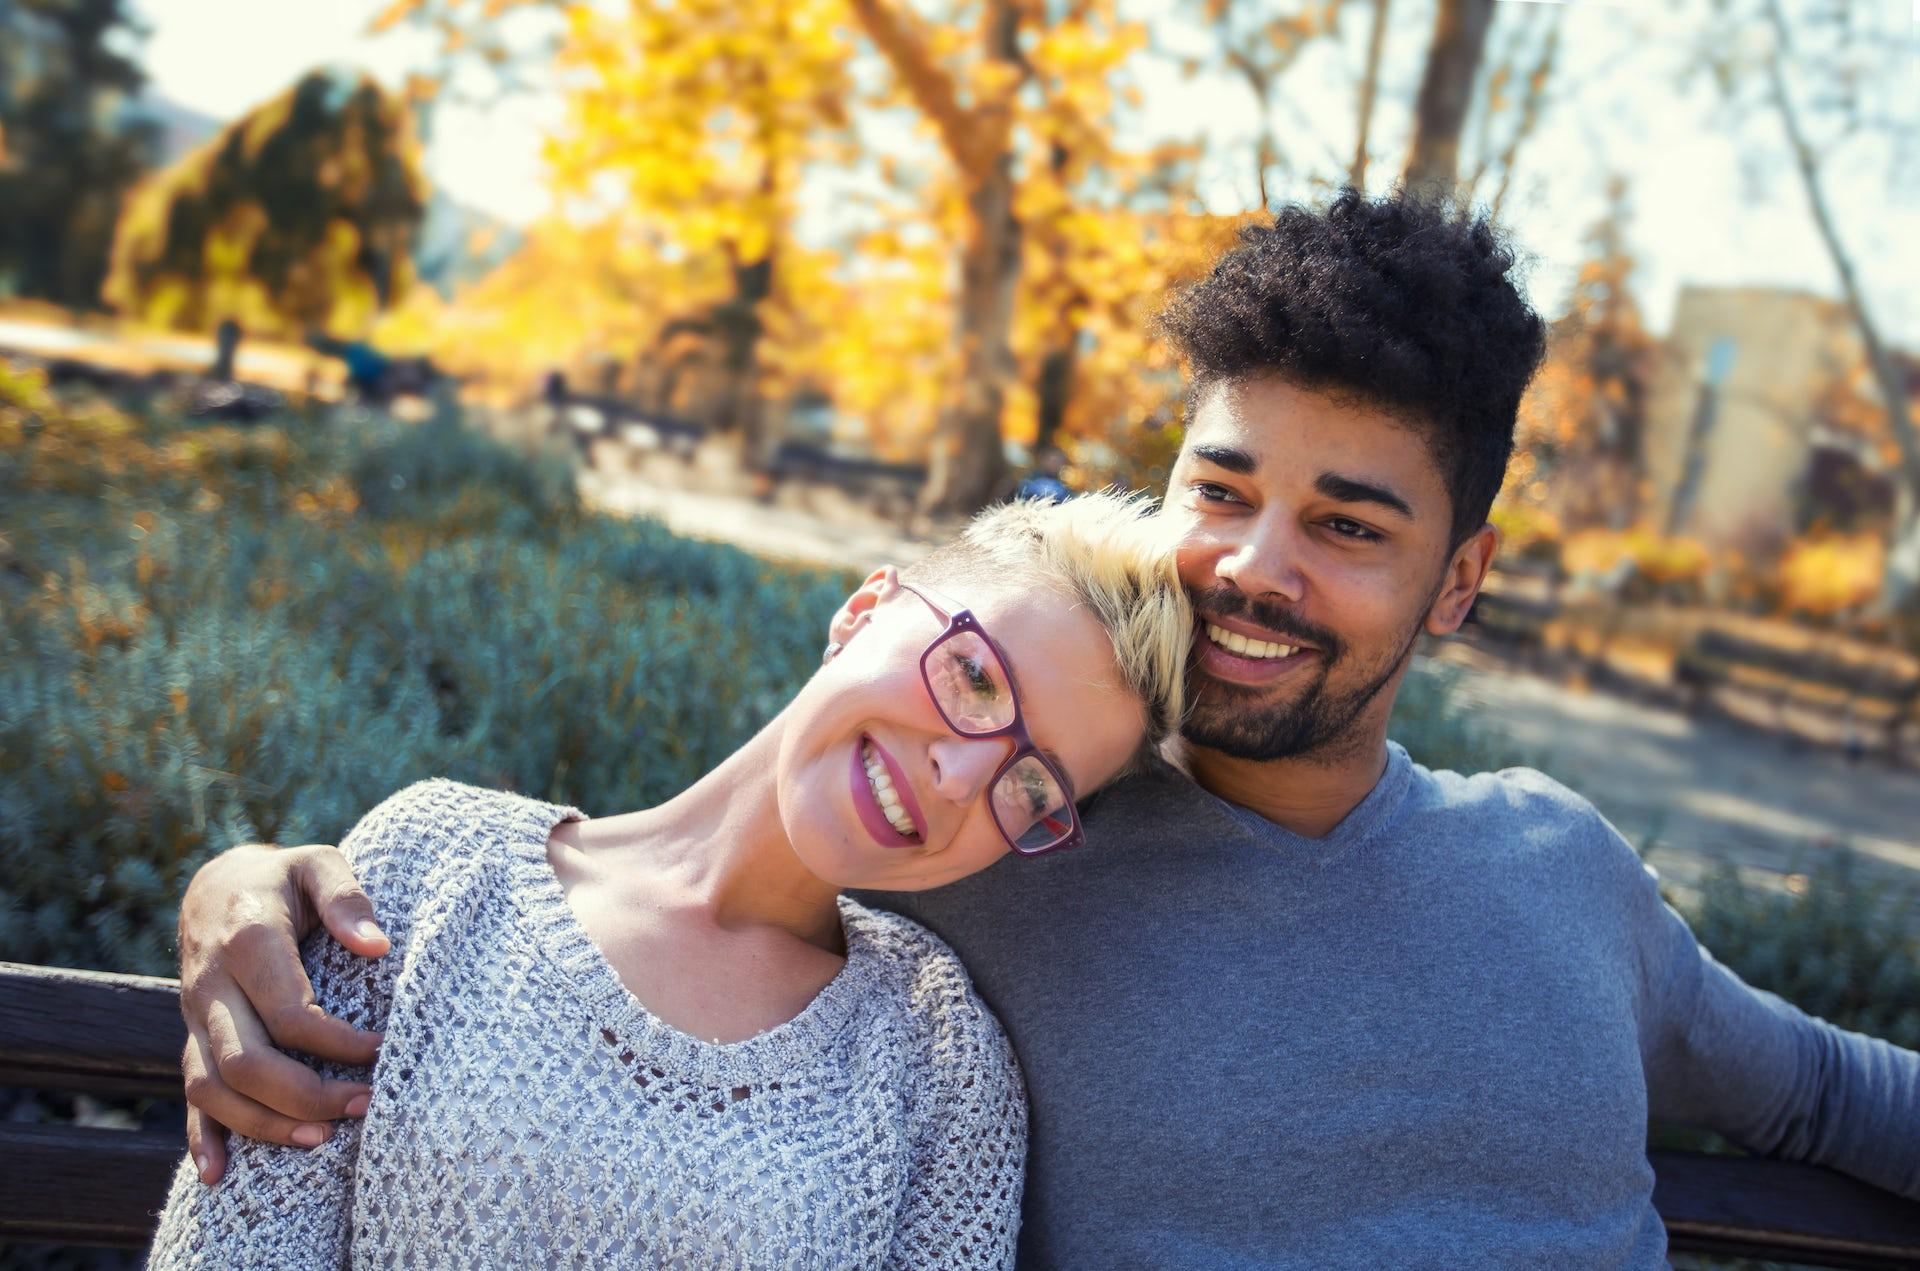 interracial dating Melbourne Australië